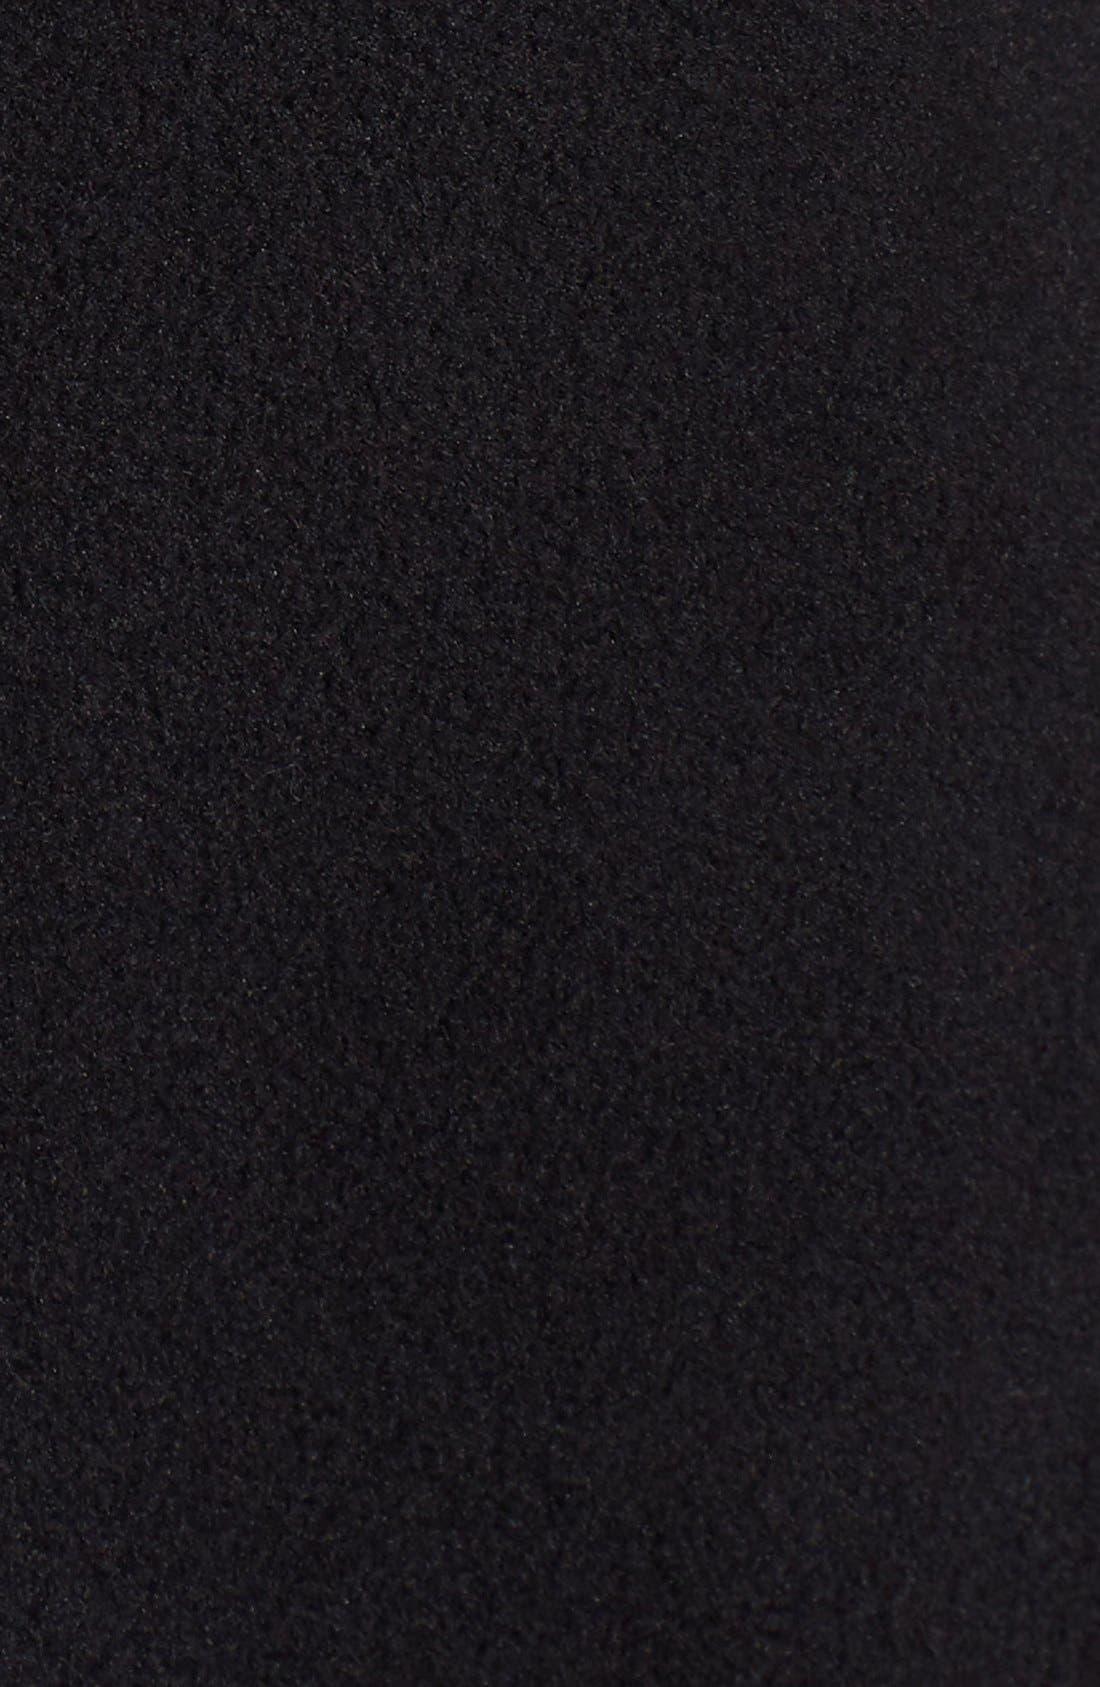 Sitka Fleece Jacket,                             Alternate thumbnail 13, color,